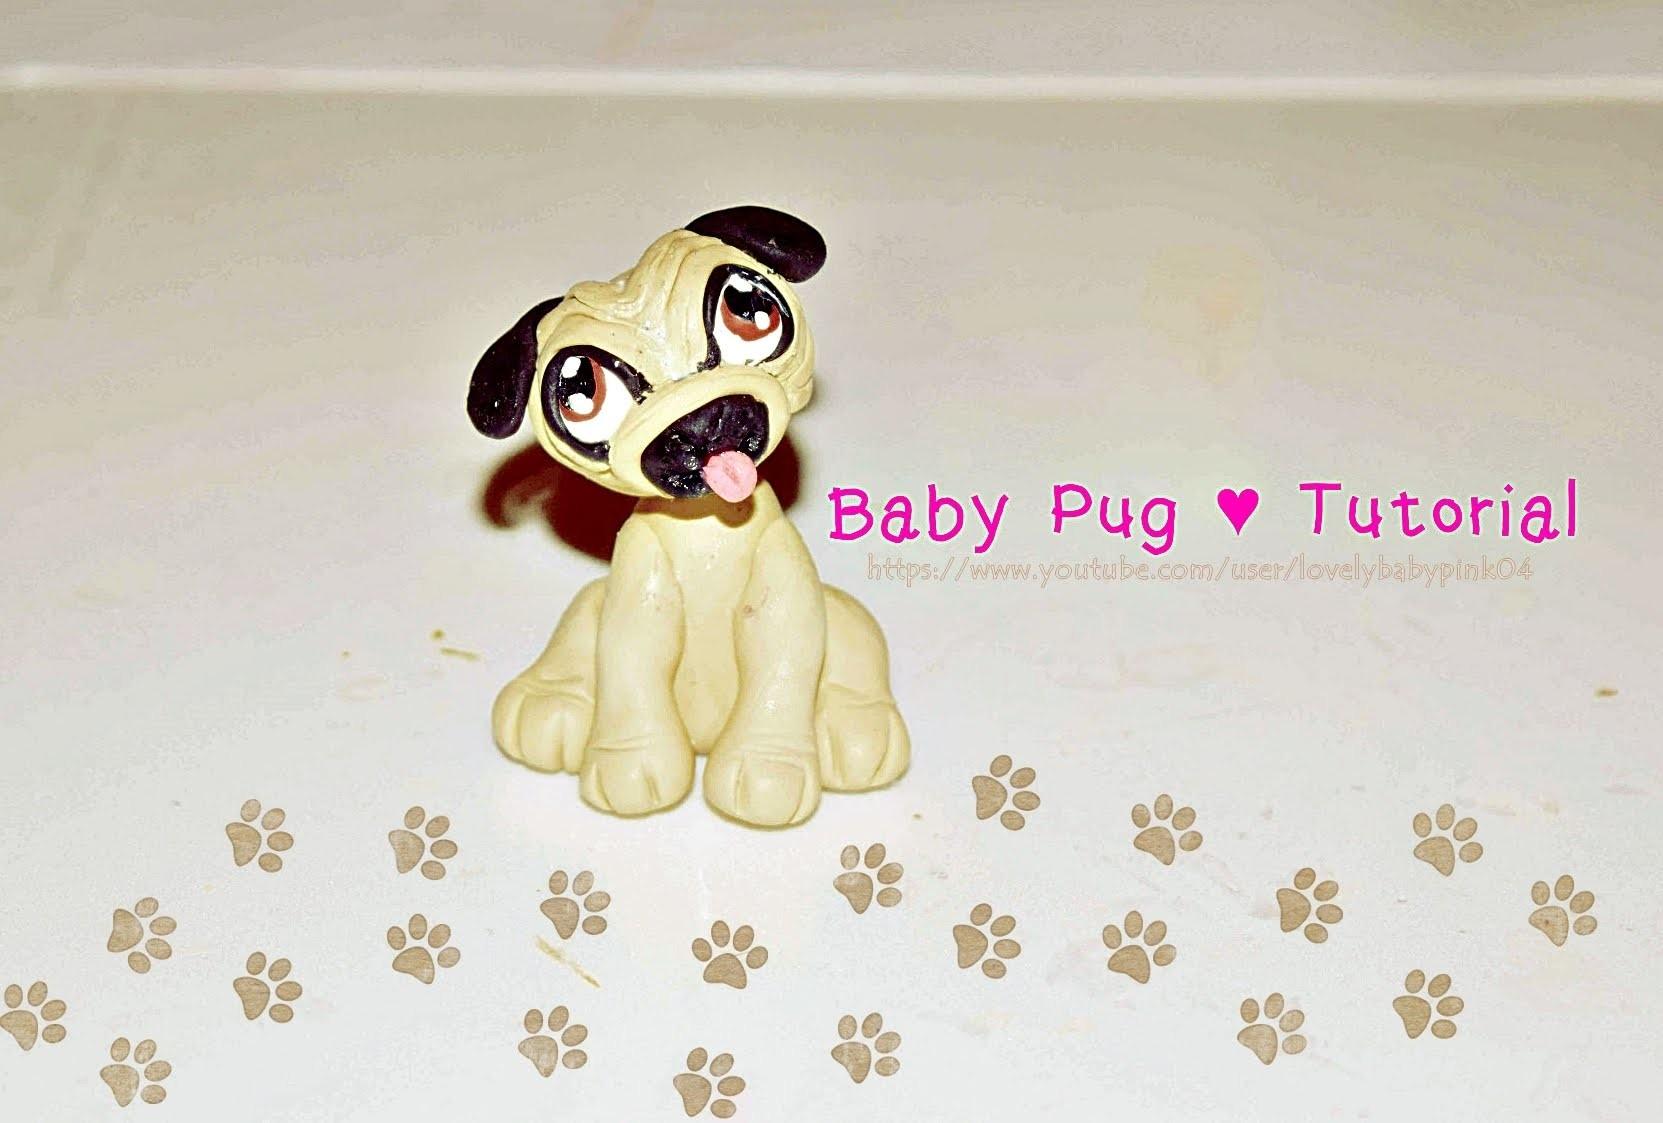 Perrito Baby Porcelana Fria - Pets Cold porcelain